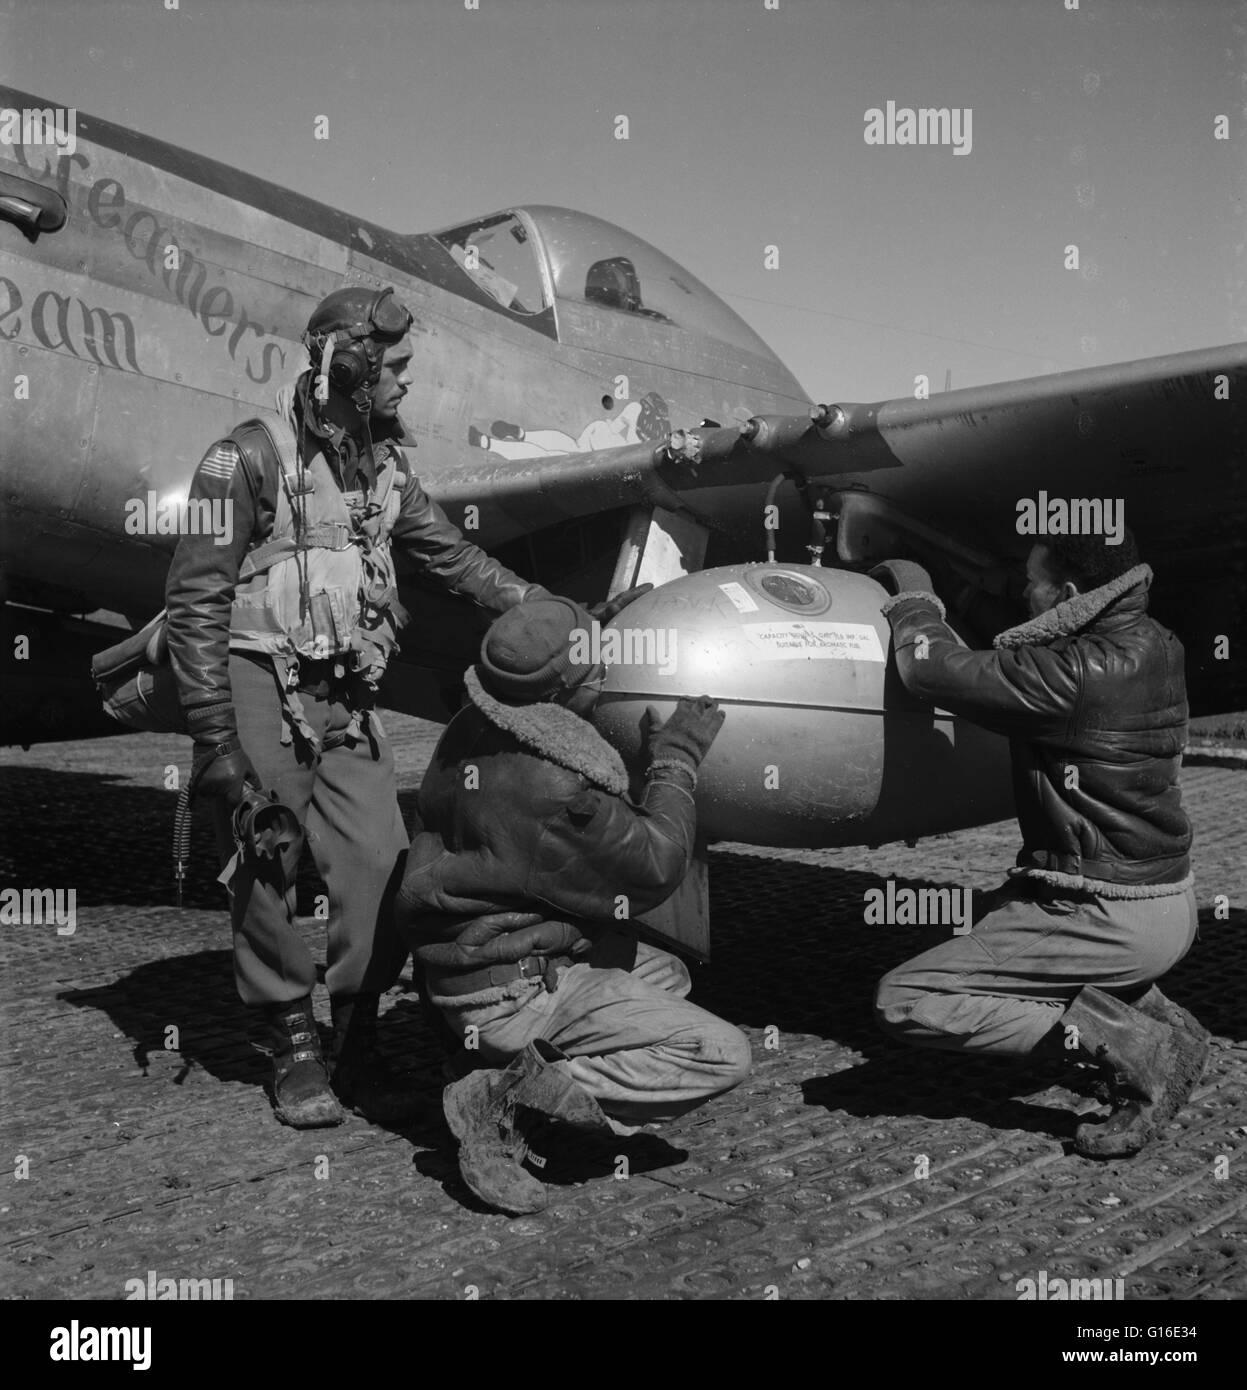 Intitulé: 'Gleed et deux aviateurs, Ramitelli Tuskegee non identifiés, de l'Italie' Photo Stock